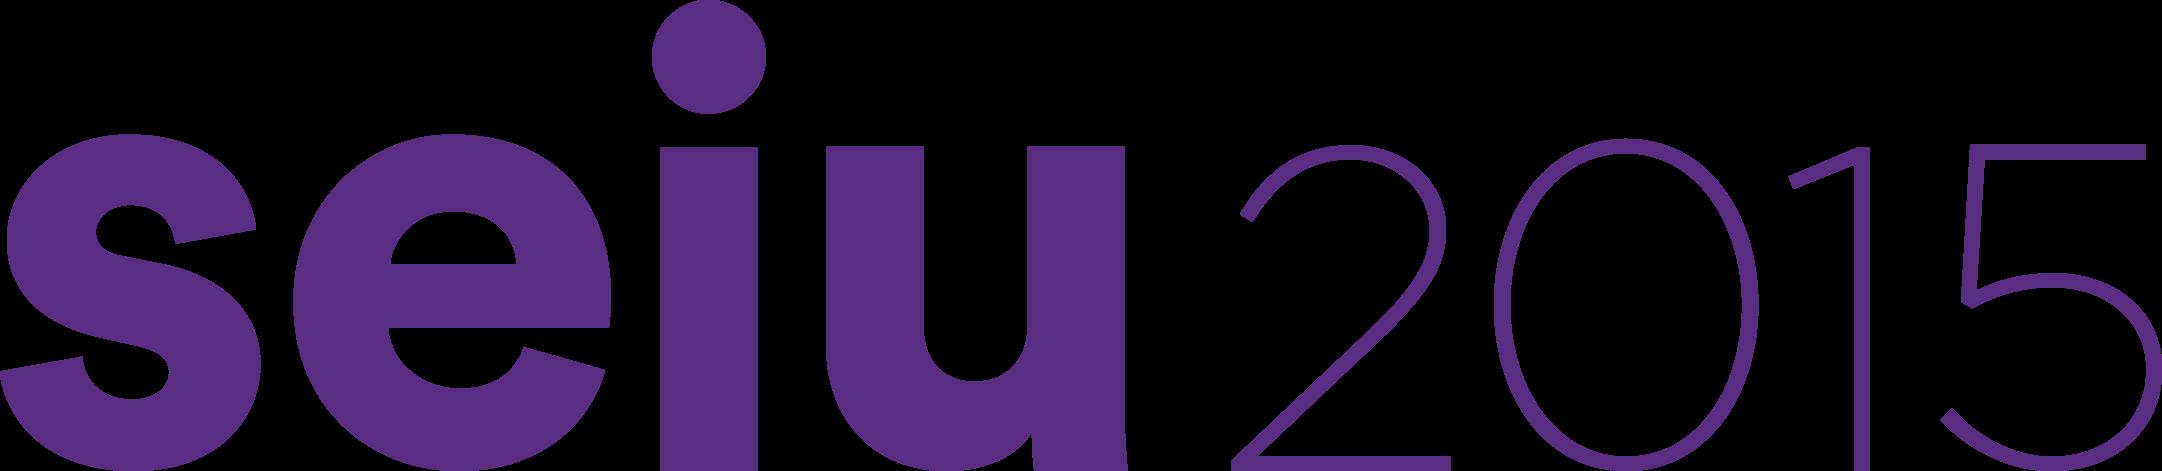 SEIU Local 2015 logo